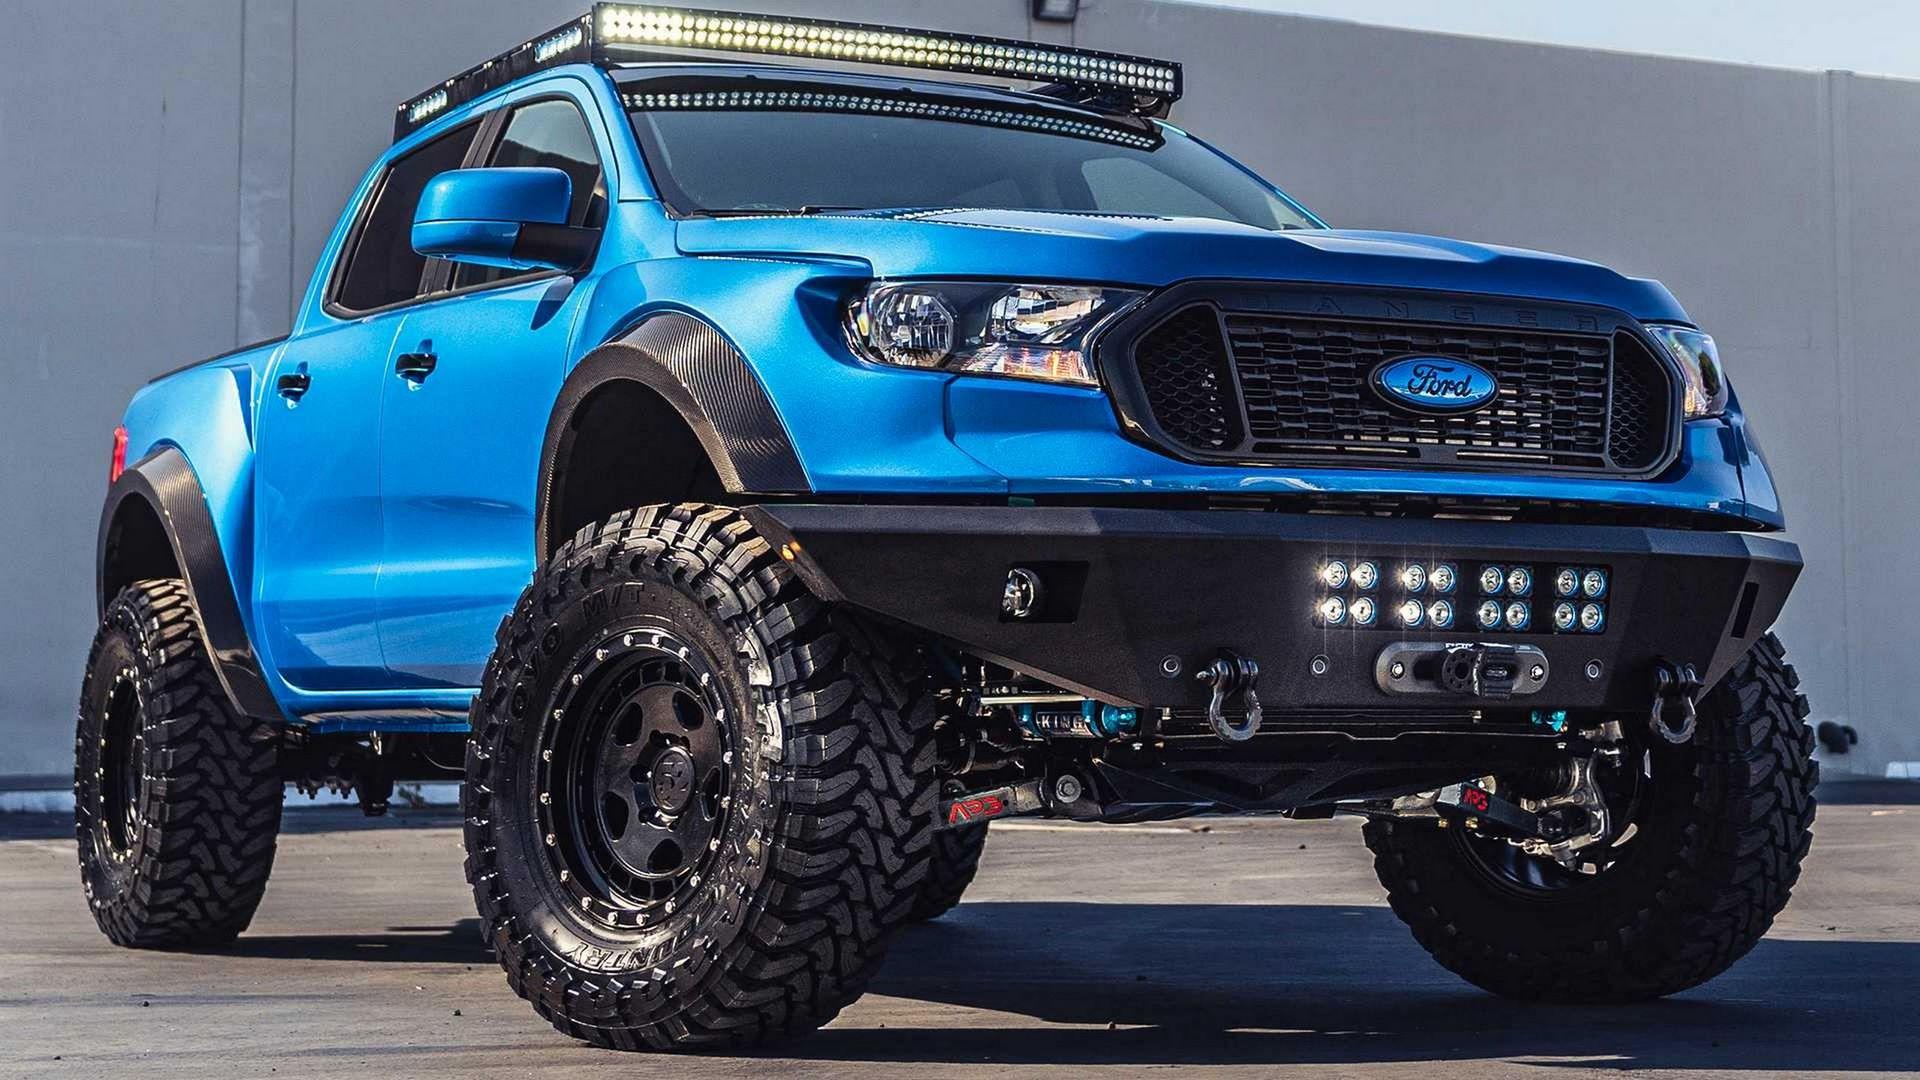 Ford-Ranger-Prorunner-By-APG-4